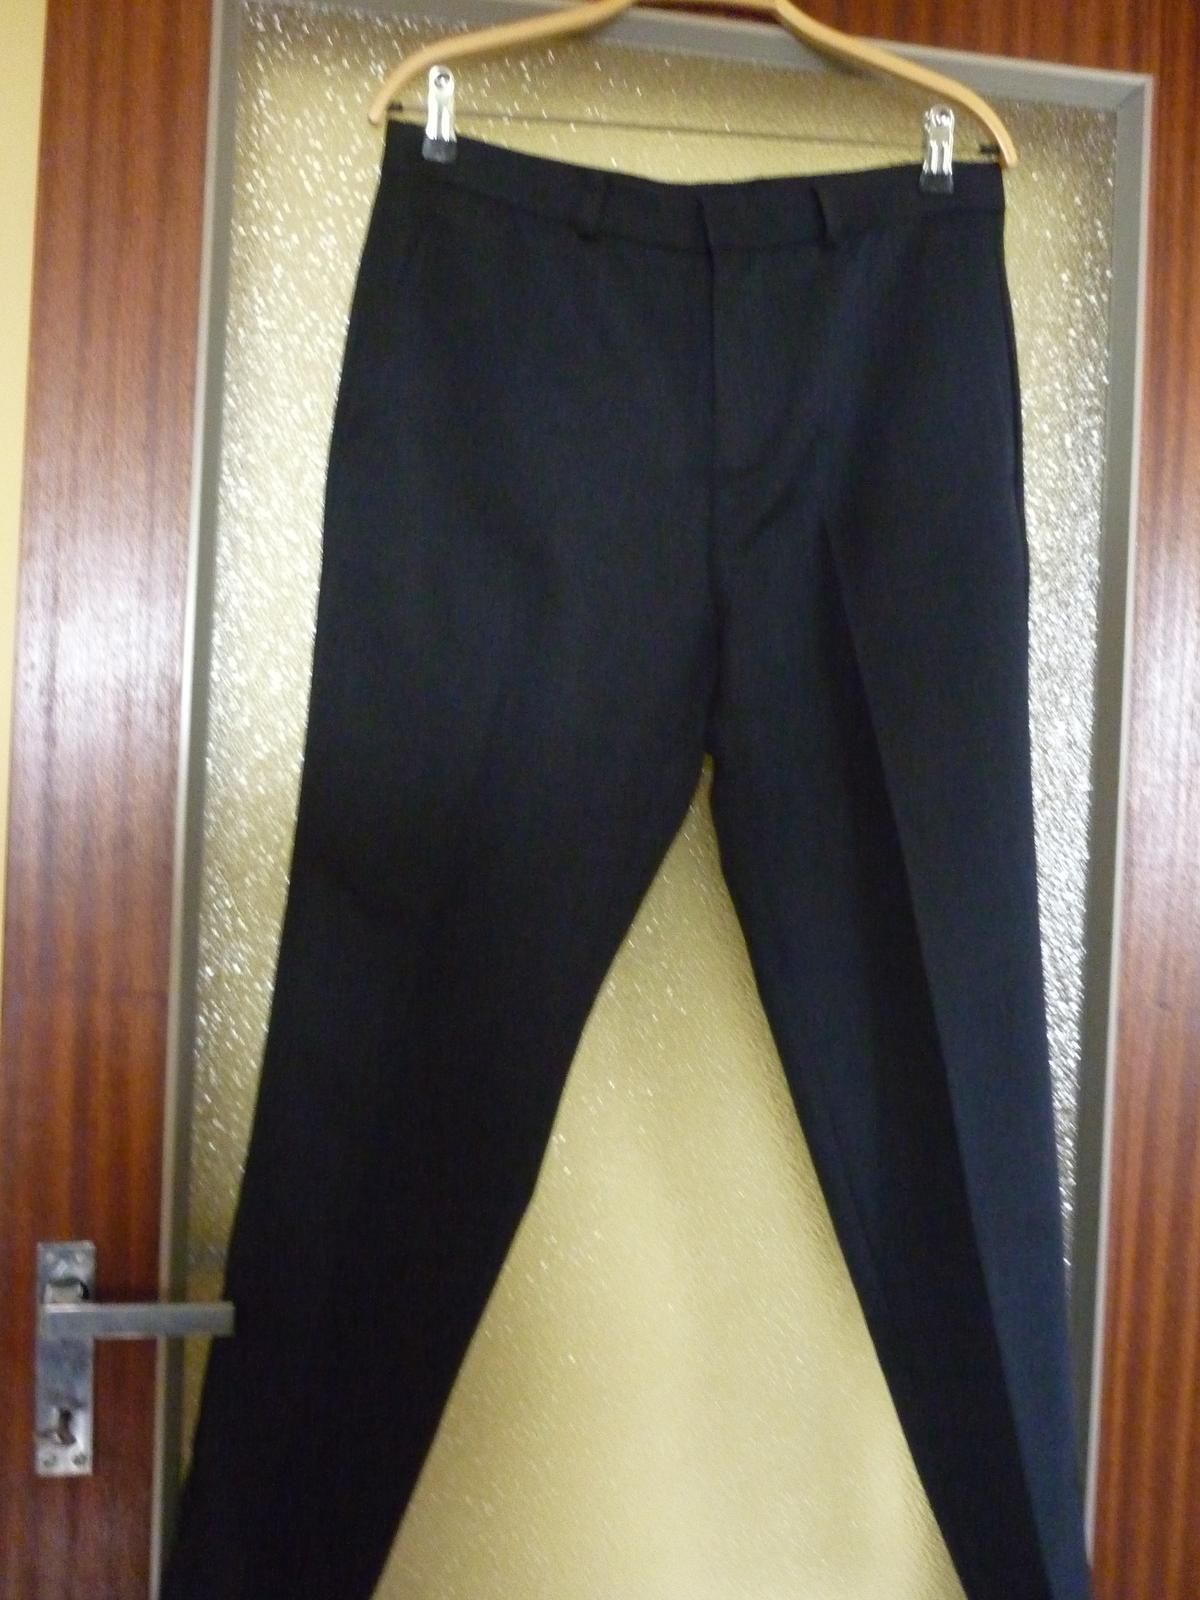 pánske nohavice - Obrázok č. 1